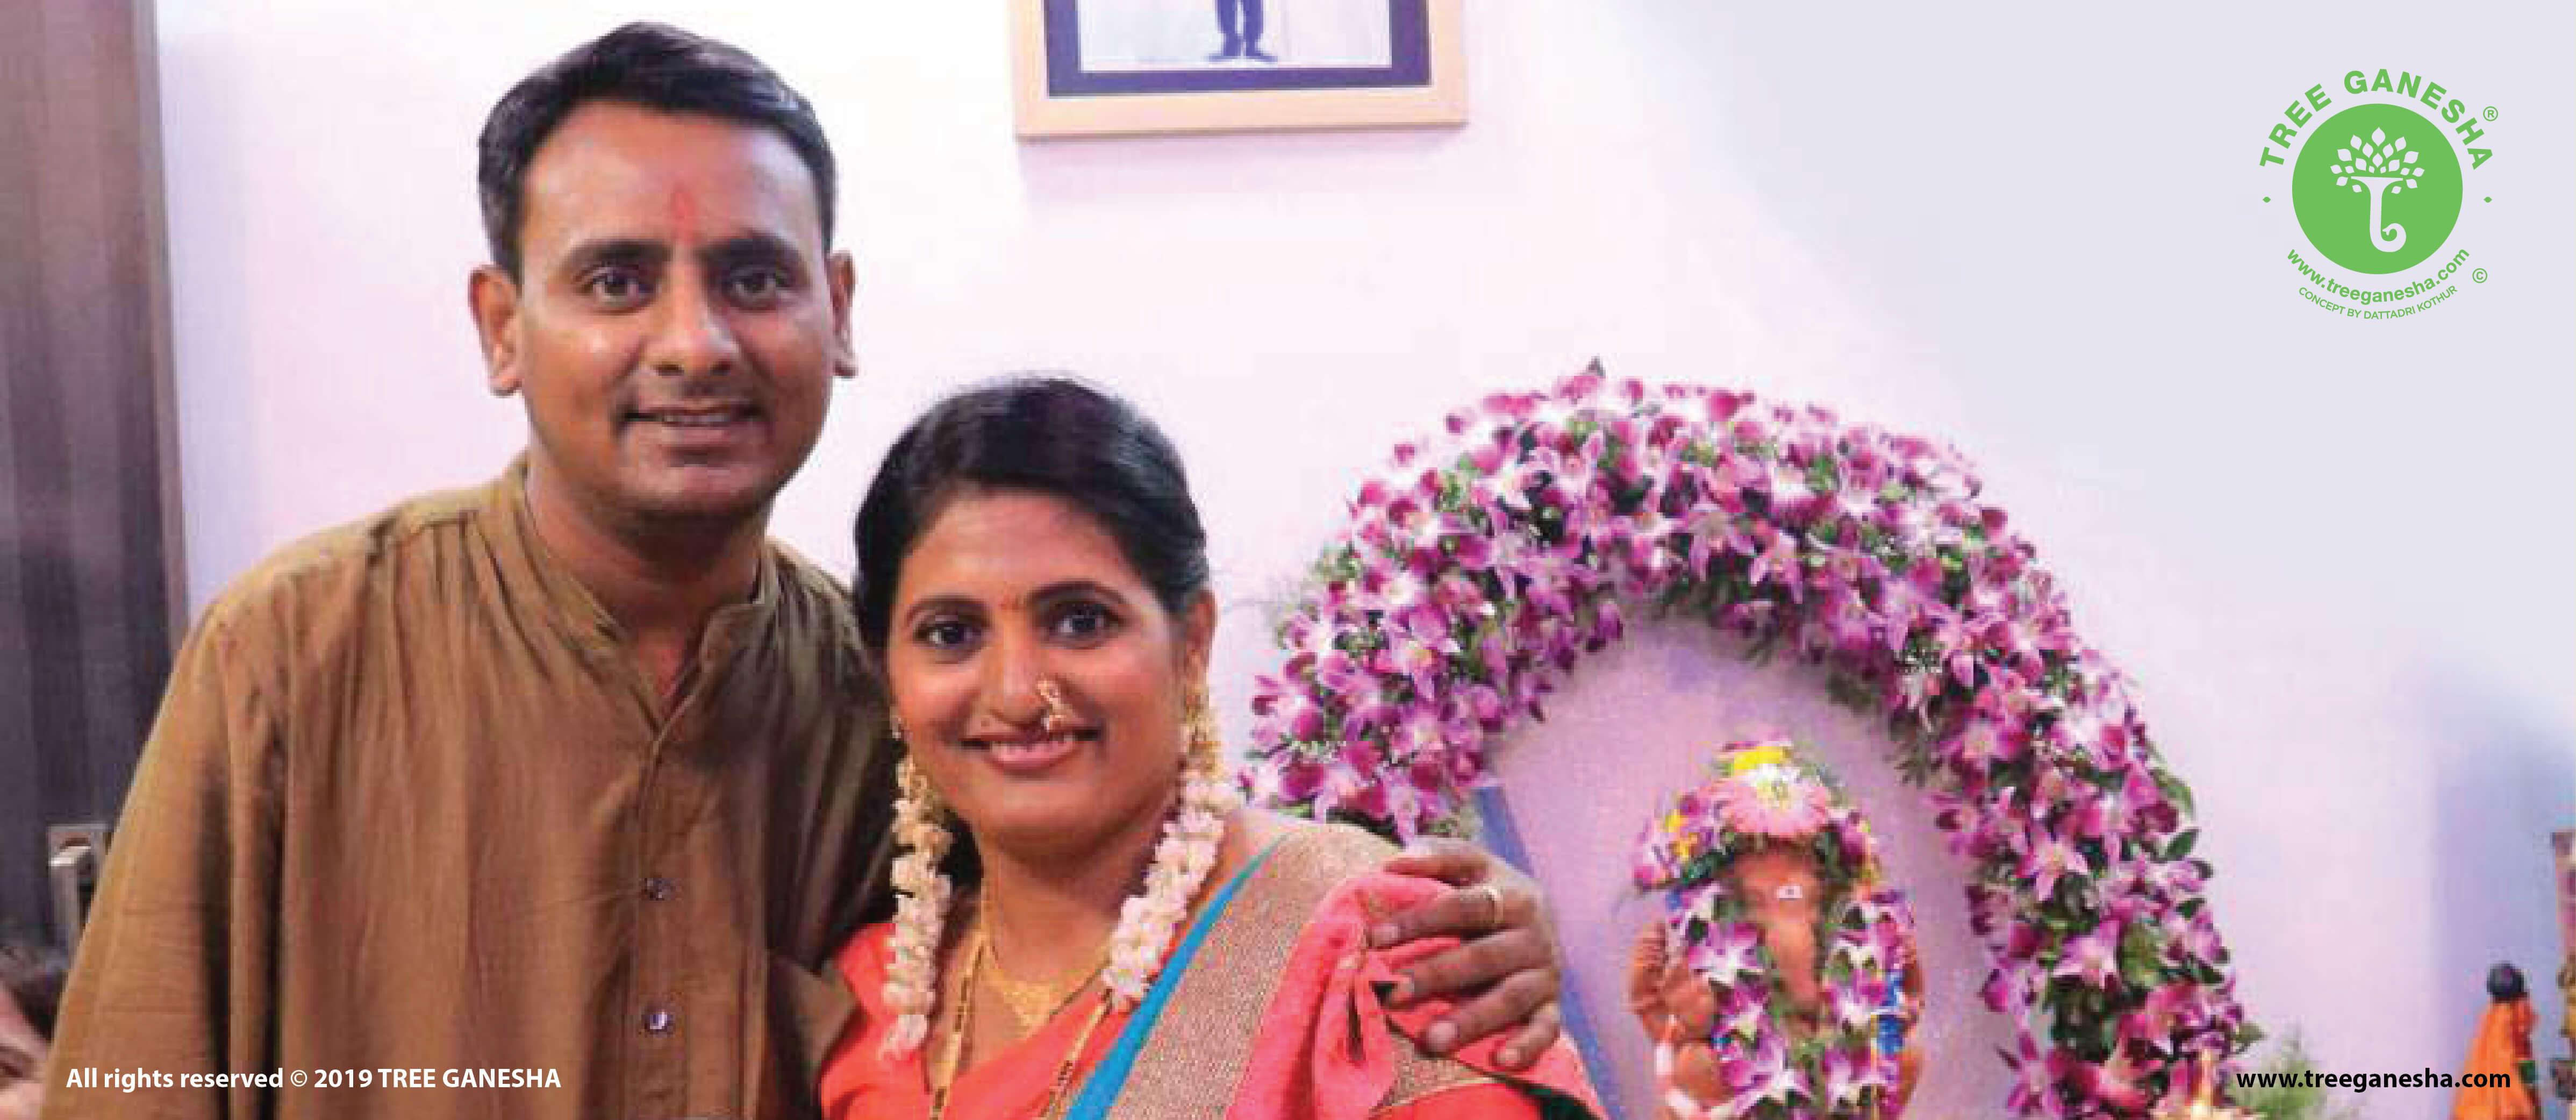 A Marathi comedian Sagar Karande adopted Tree Ganesha in his home